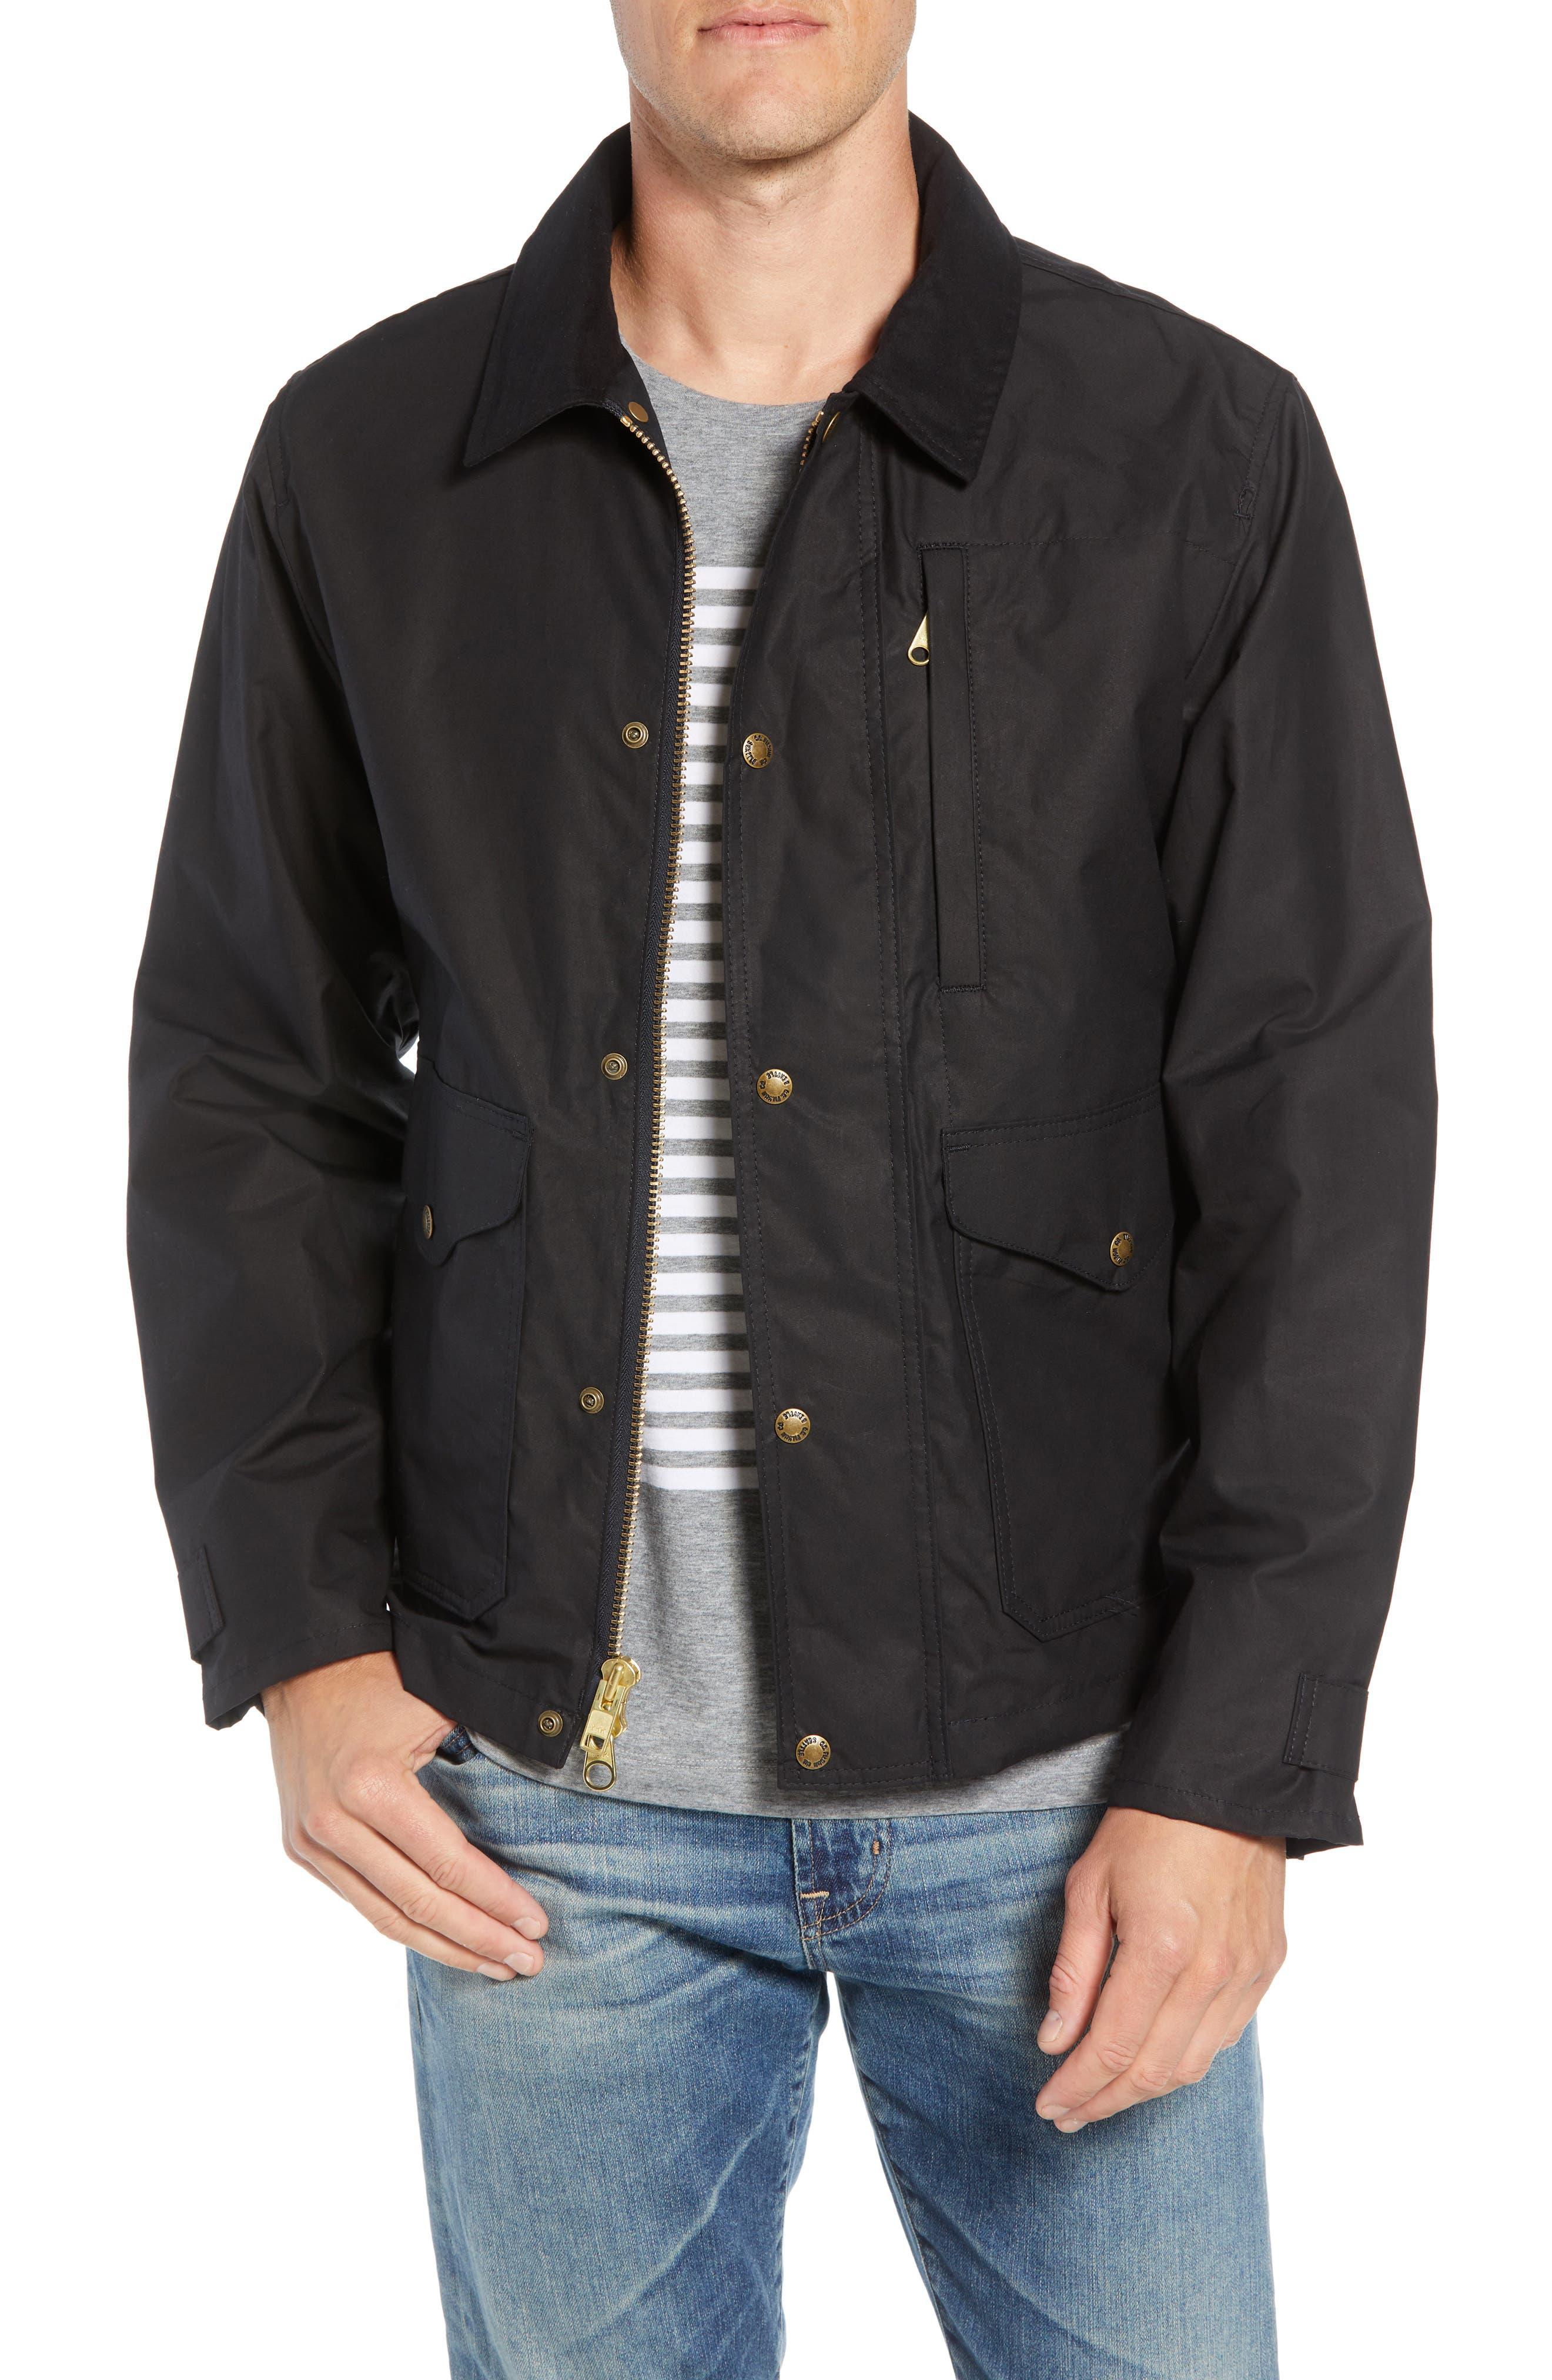 Short Mile Marker Waxed Cotton Jacket,                         Main,                         color, BLACK